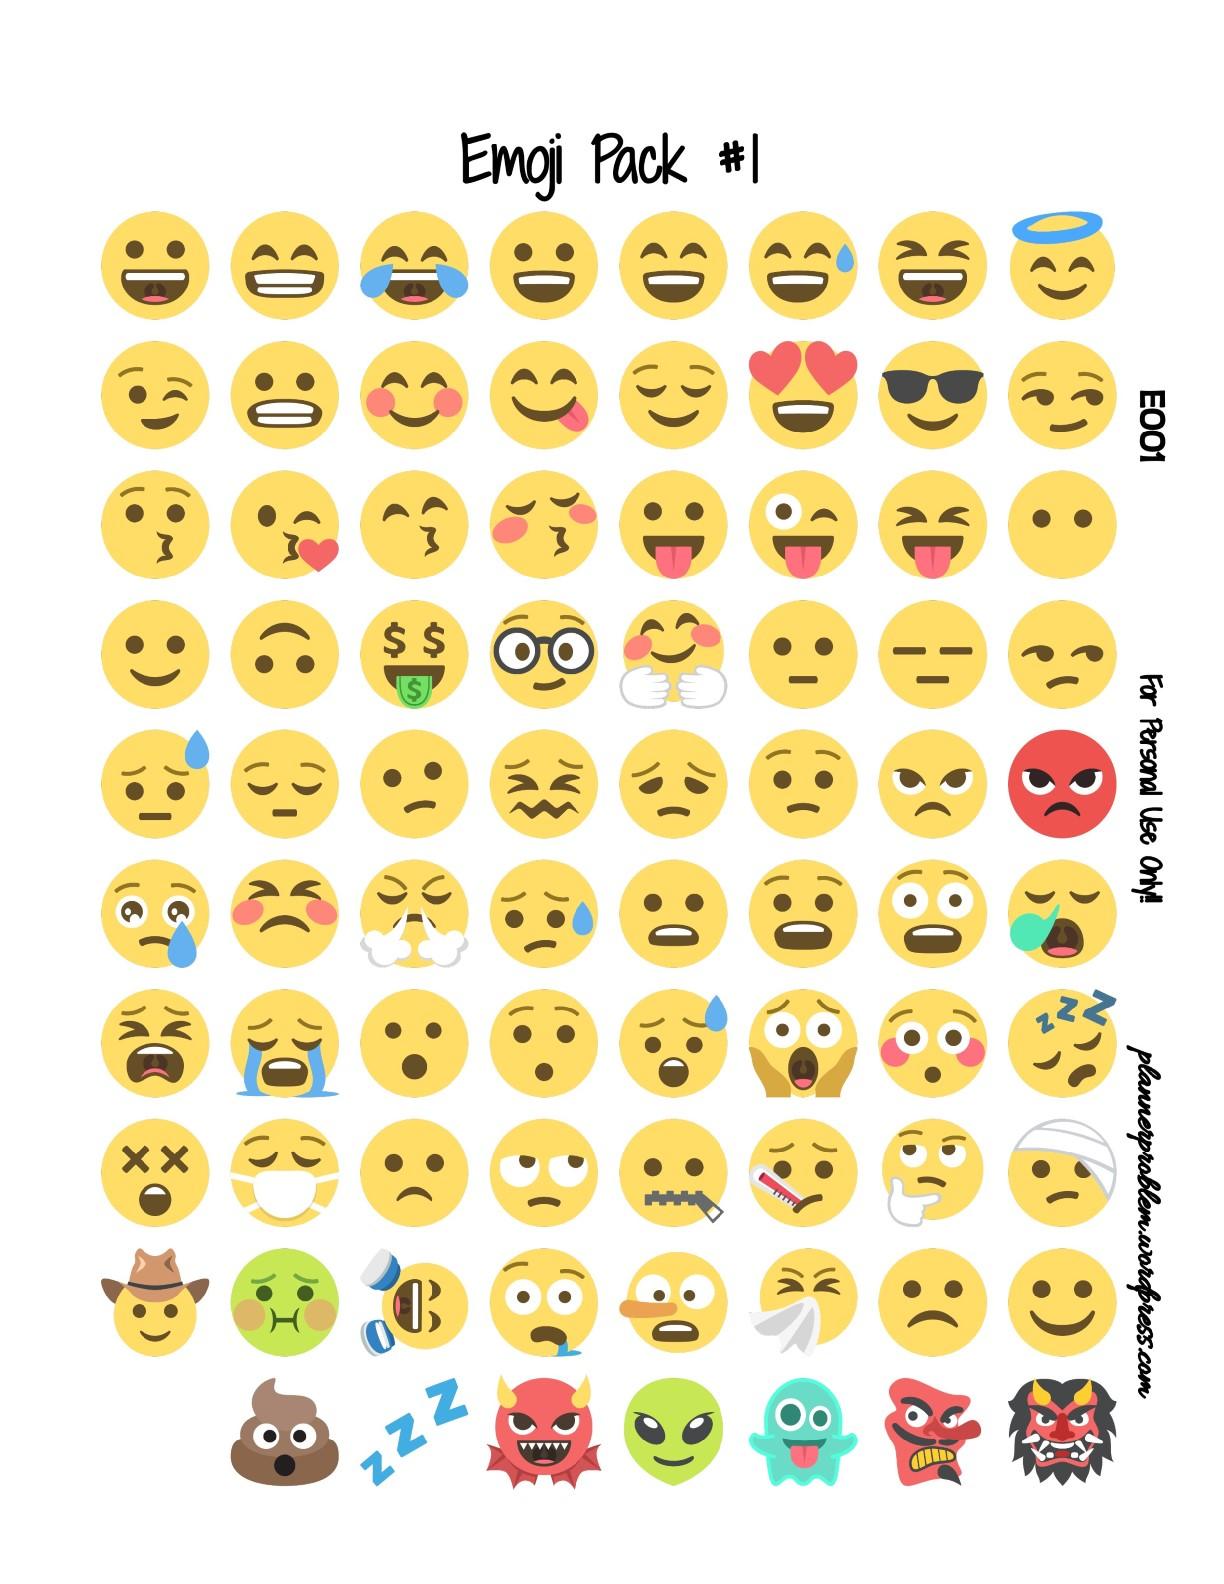 photograph regarding Emojis Printable identified as Emoji Pack #1 Cost-free Printable Planner Stickers PlannerProblem